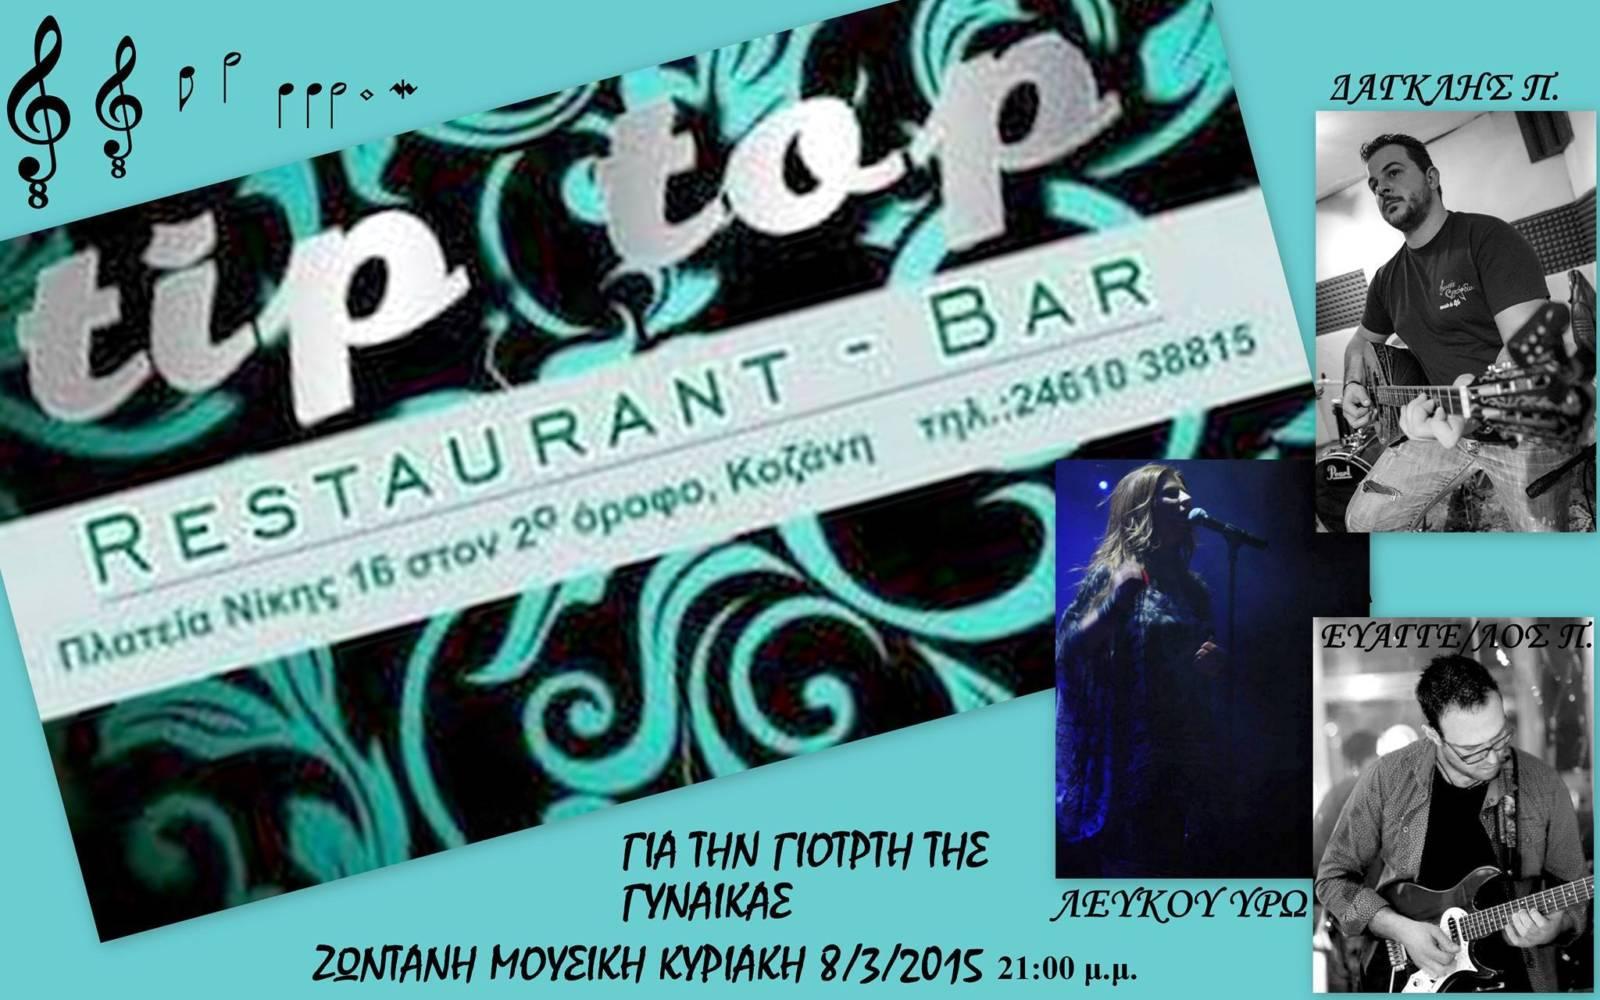 Restaurant-Bar Tip-Top Κοζάνη: Ζωντανή μουσική για τη γιορτή της γυναίκας, την Κυριακή 8 Μαρτίου